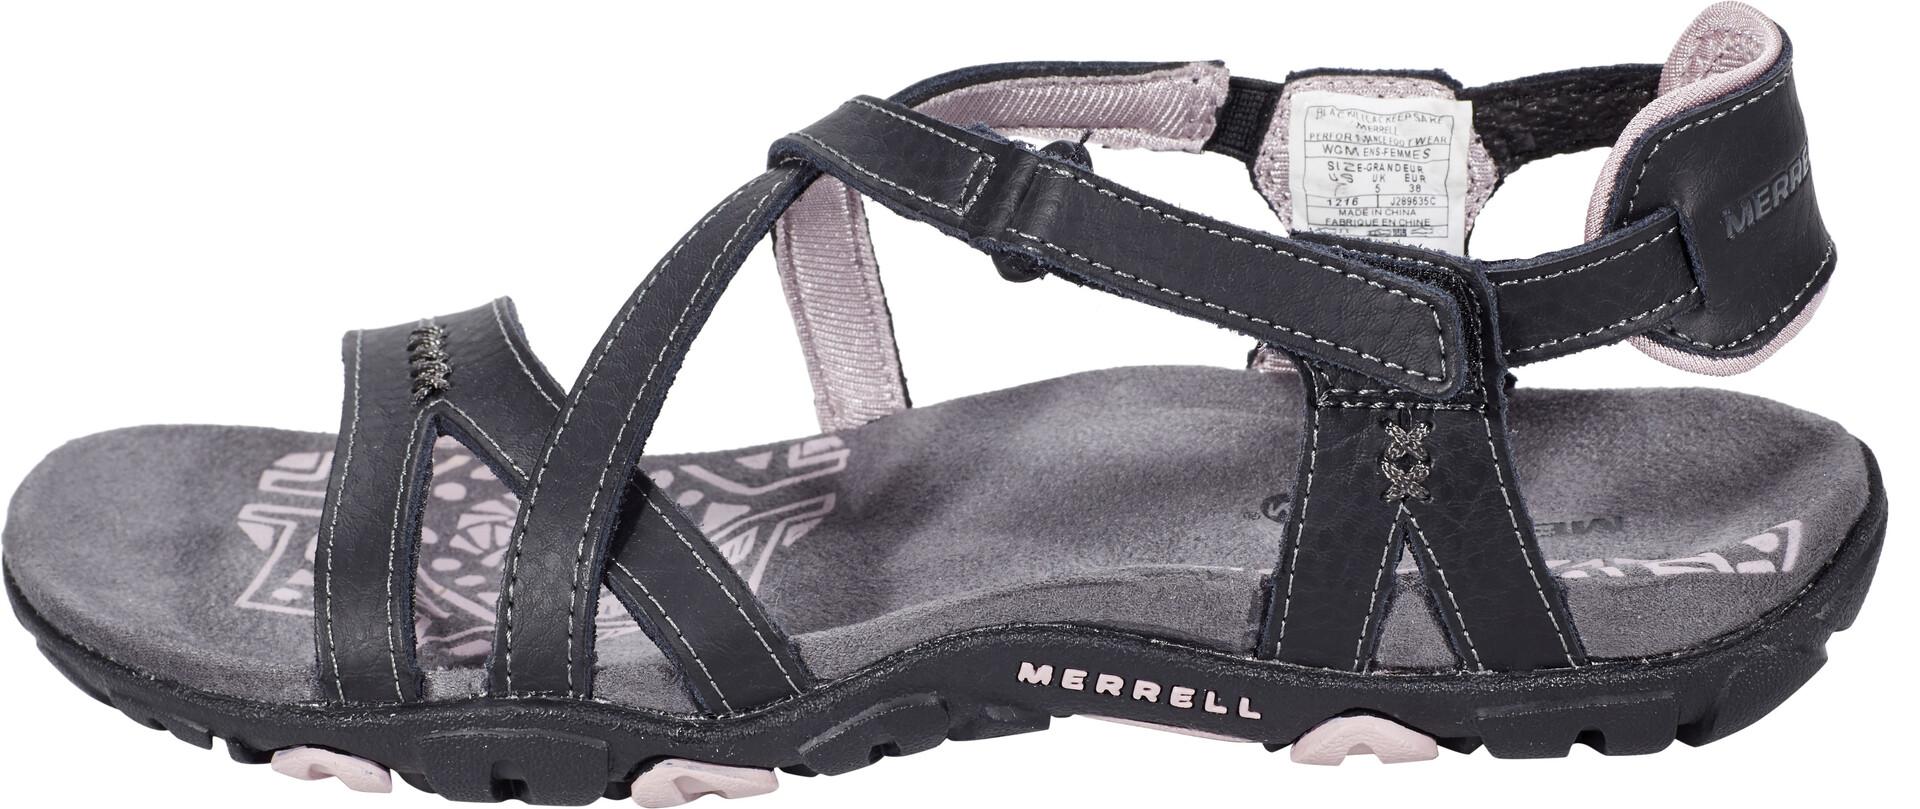 Merrell Ltr Sandspur Keepsake Women Rose Blacklilac Sandals j4ALR35